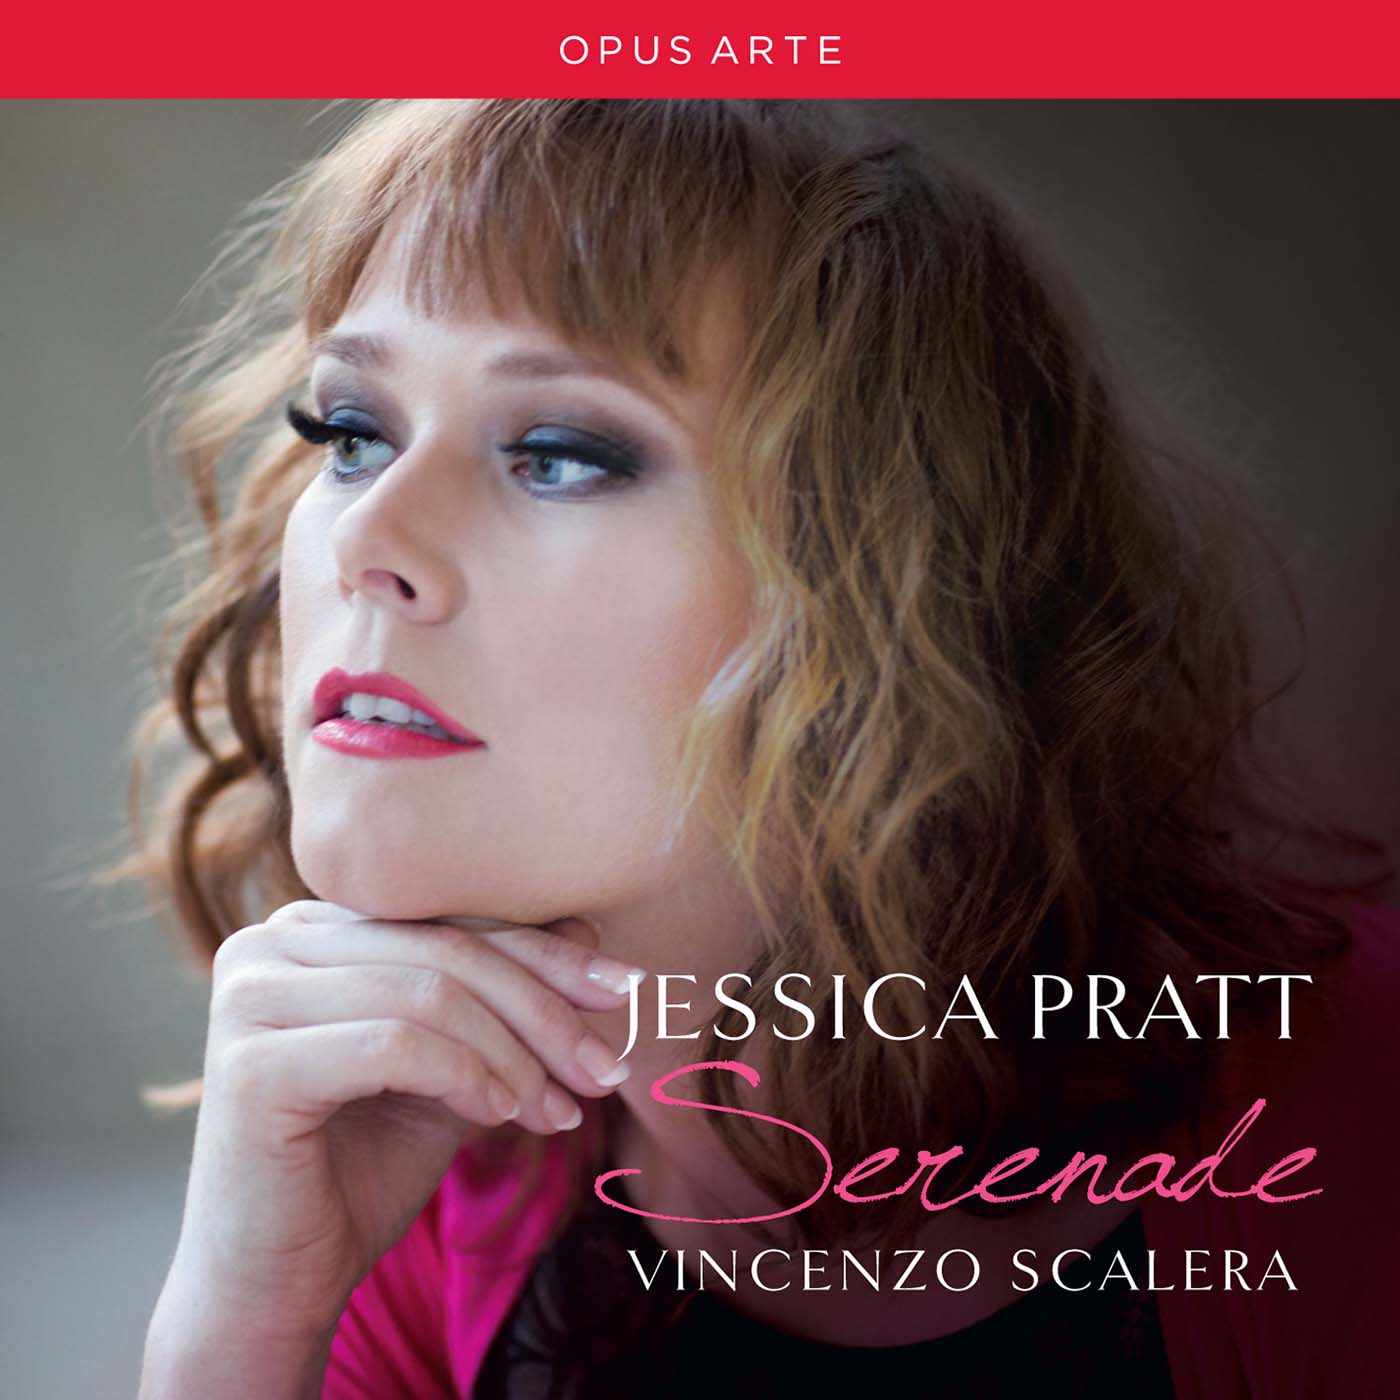 SINGER SPOTLIGHT: Soprano JESSICA PRATT's début solo recital disc SERENADE on the Opus Arte label [Cover art © by Opus Arte]